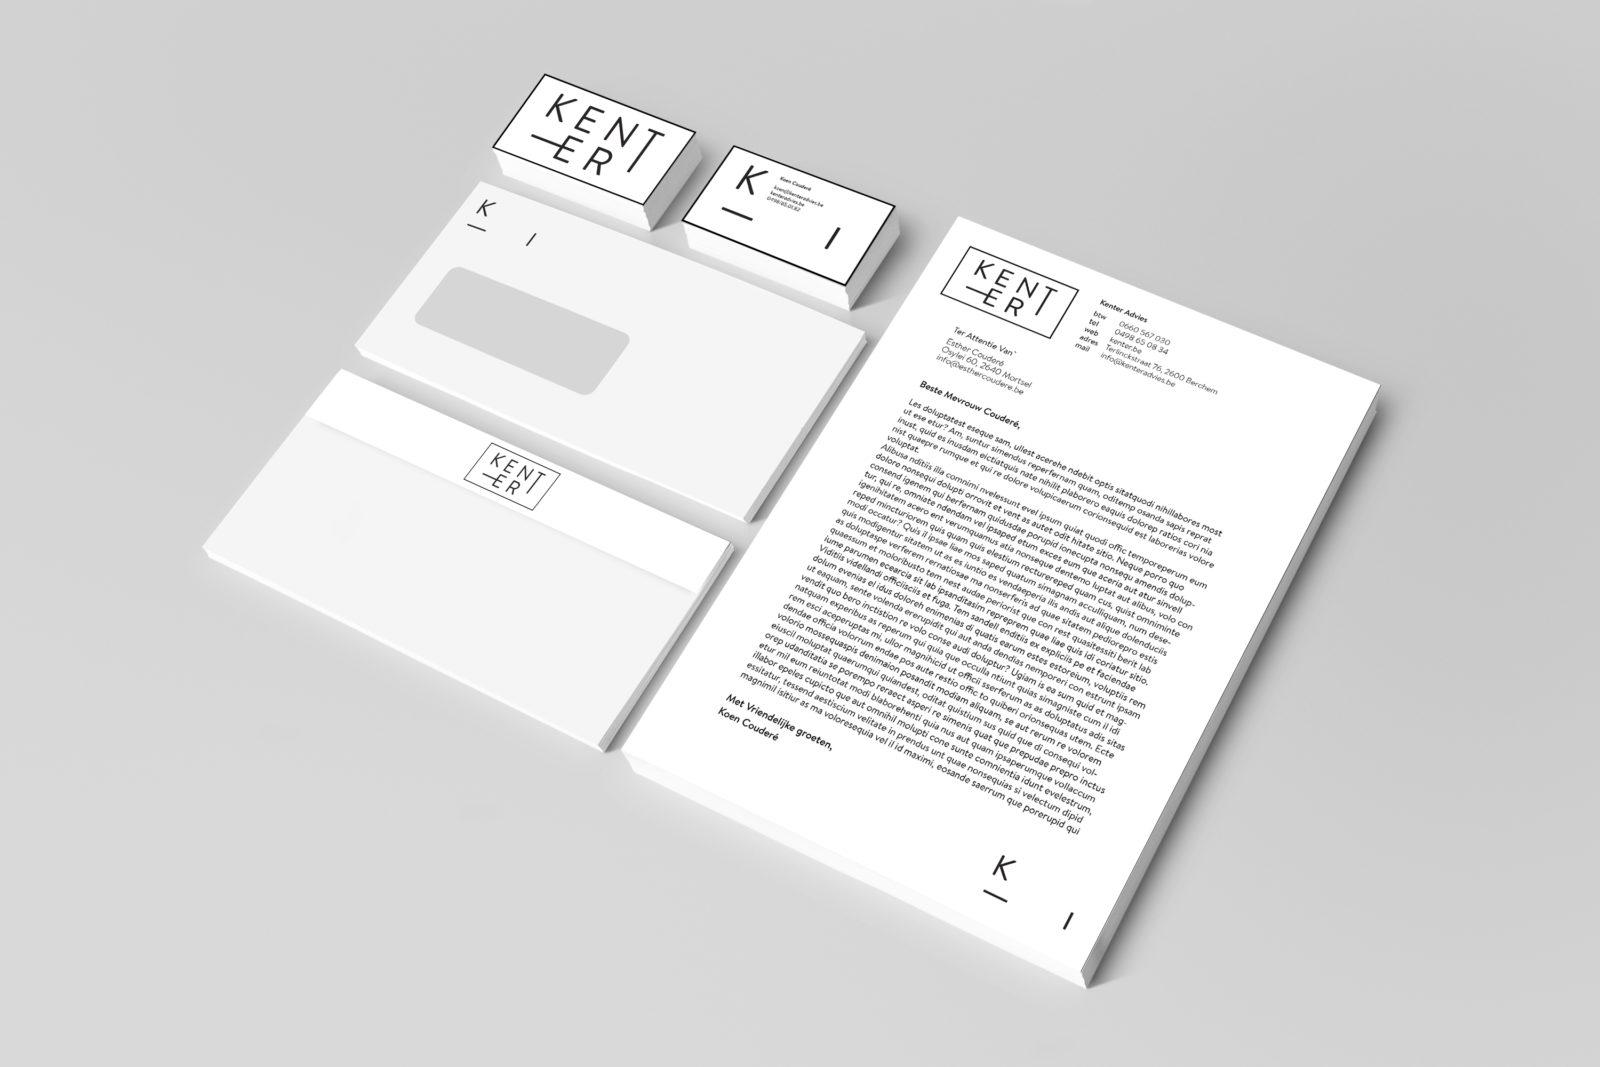 Kenter_advies_mockup_identity_huisstijl